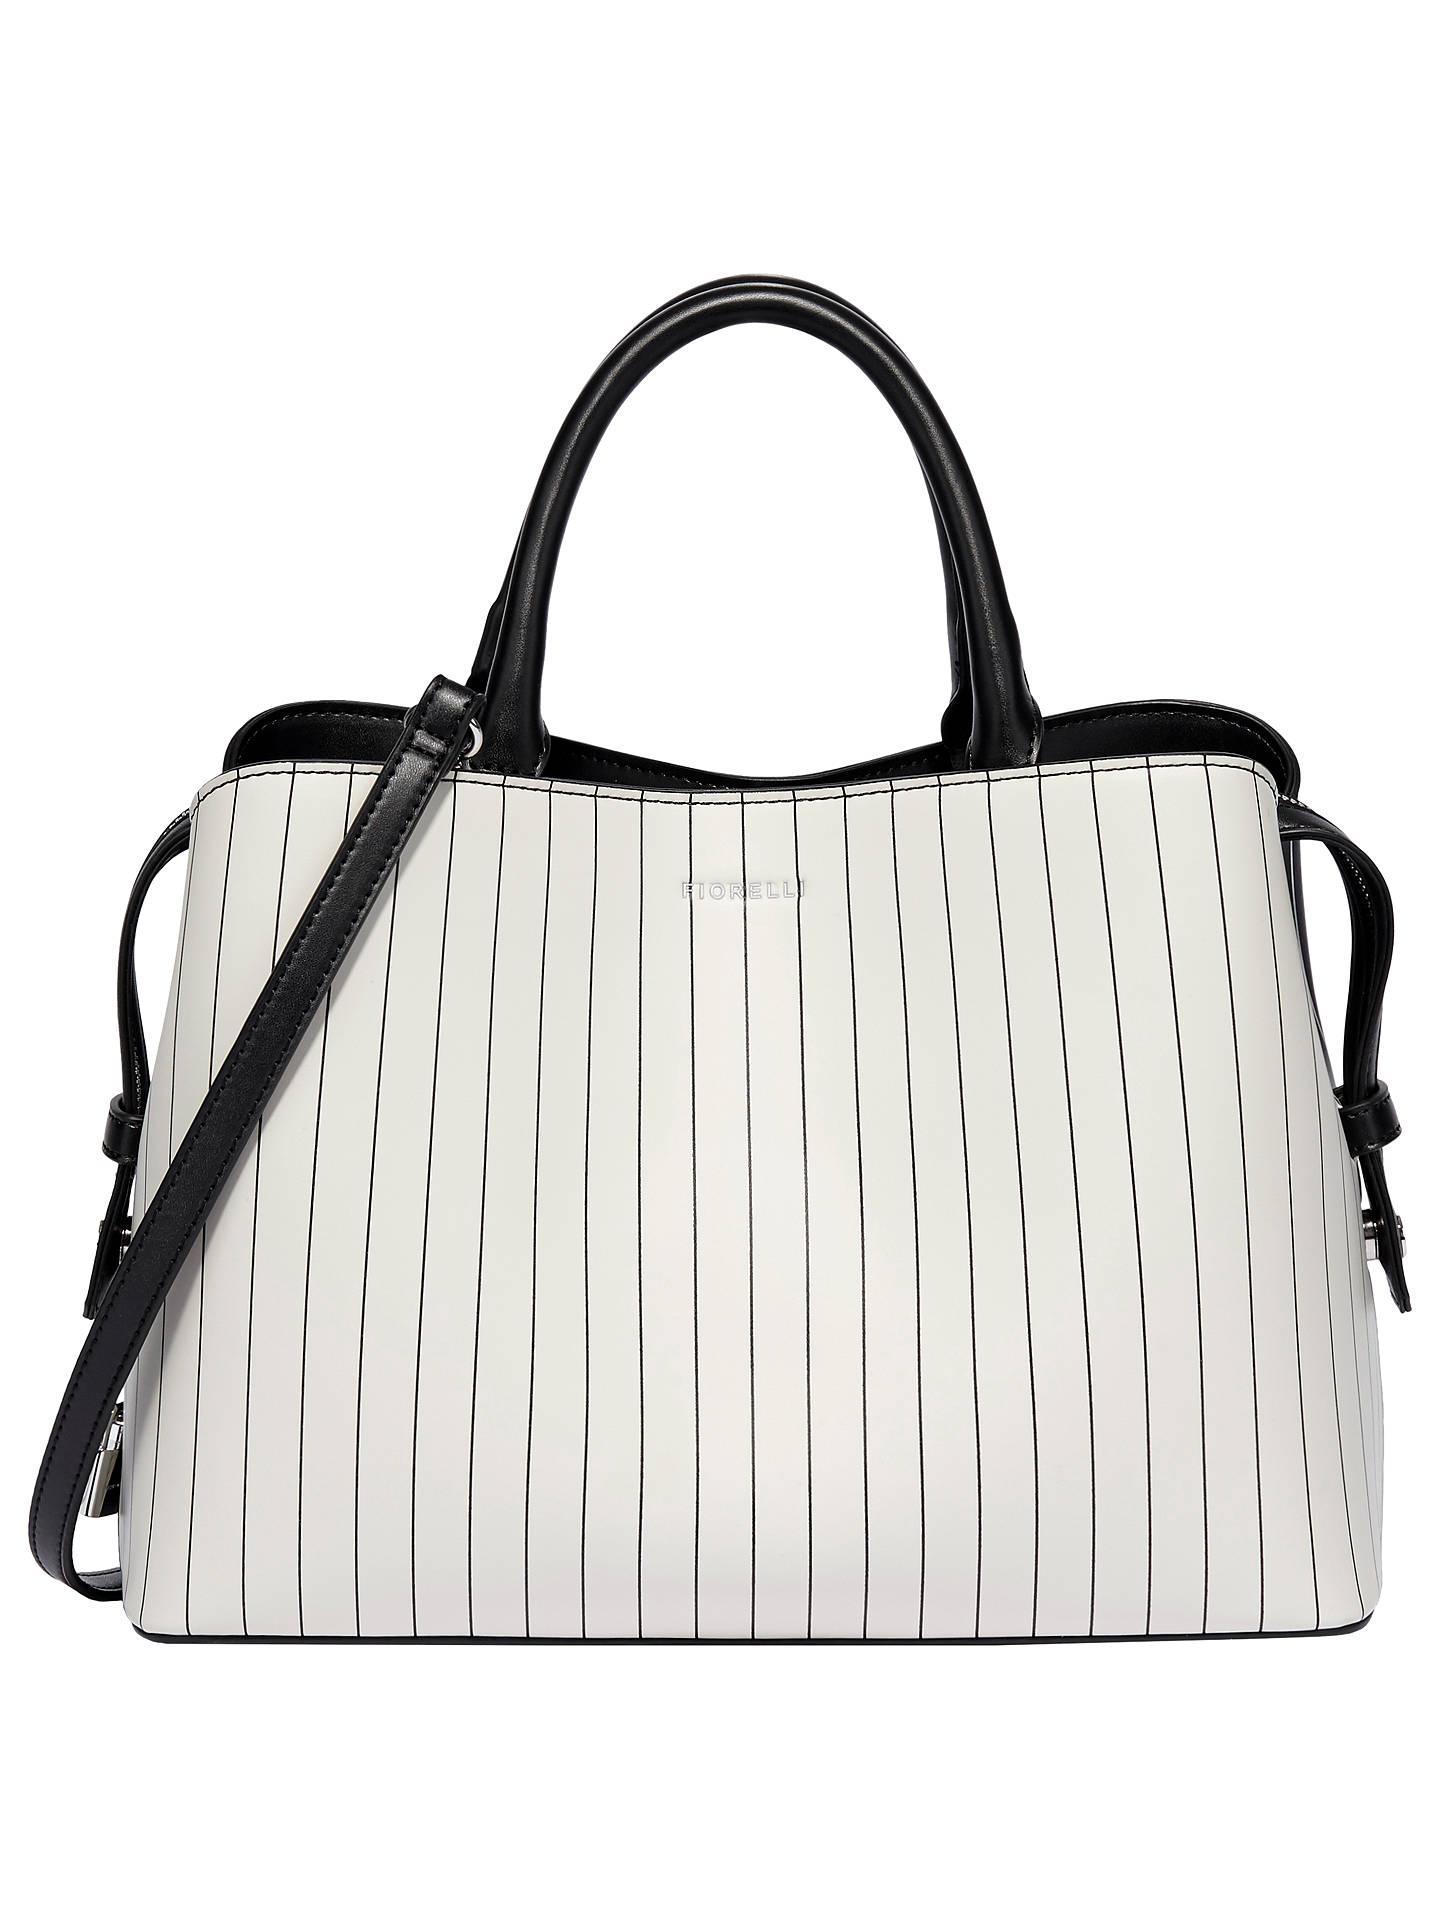 Fiorelli Bethnal Triple Compartment Grab Bag Whitestripe Online At Johnlewis